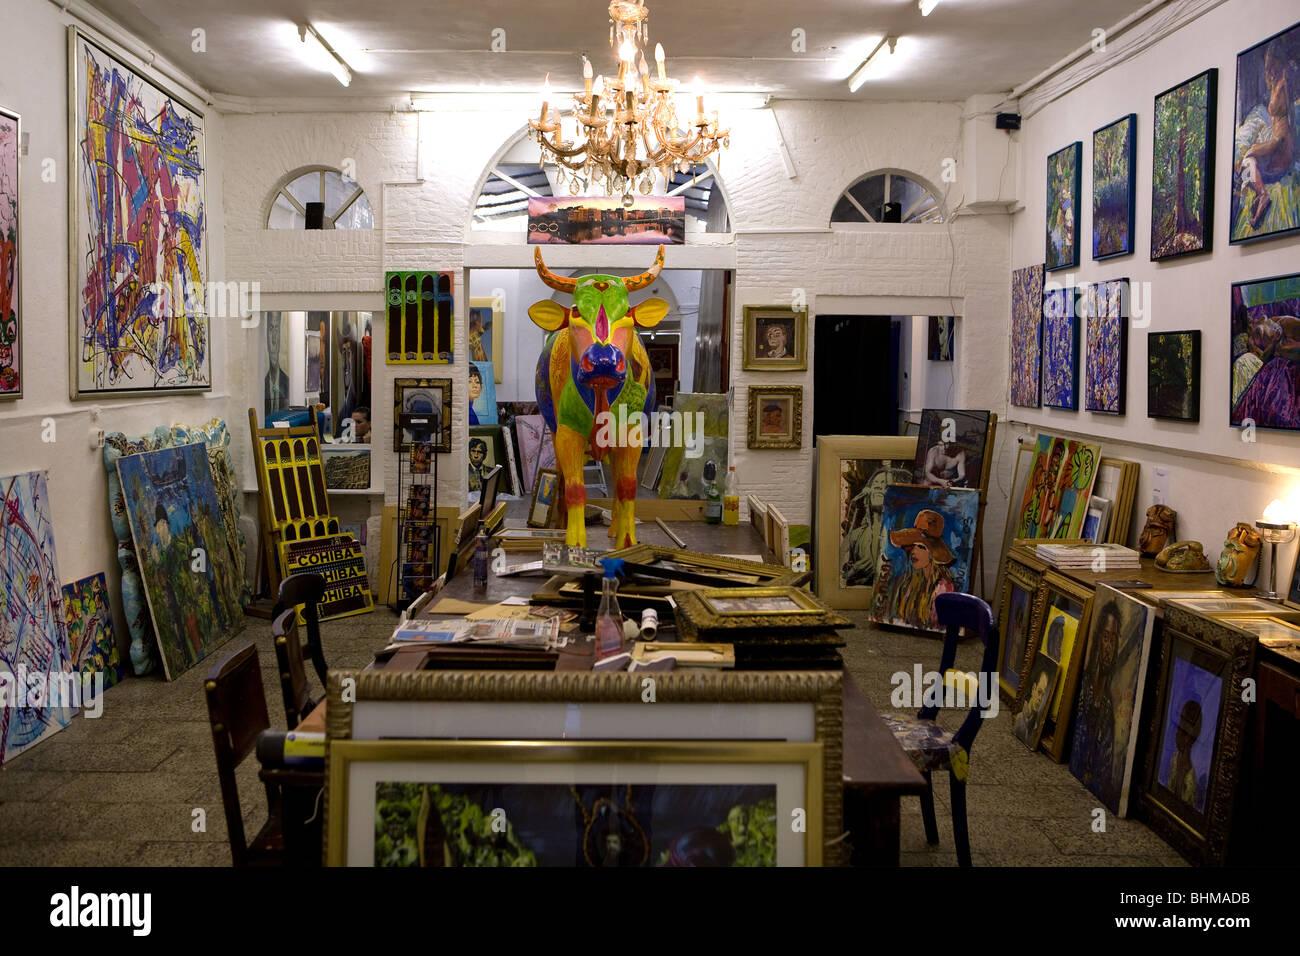 Holland amsterdam art gallery stock photo  alamy